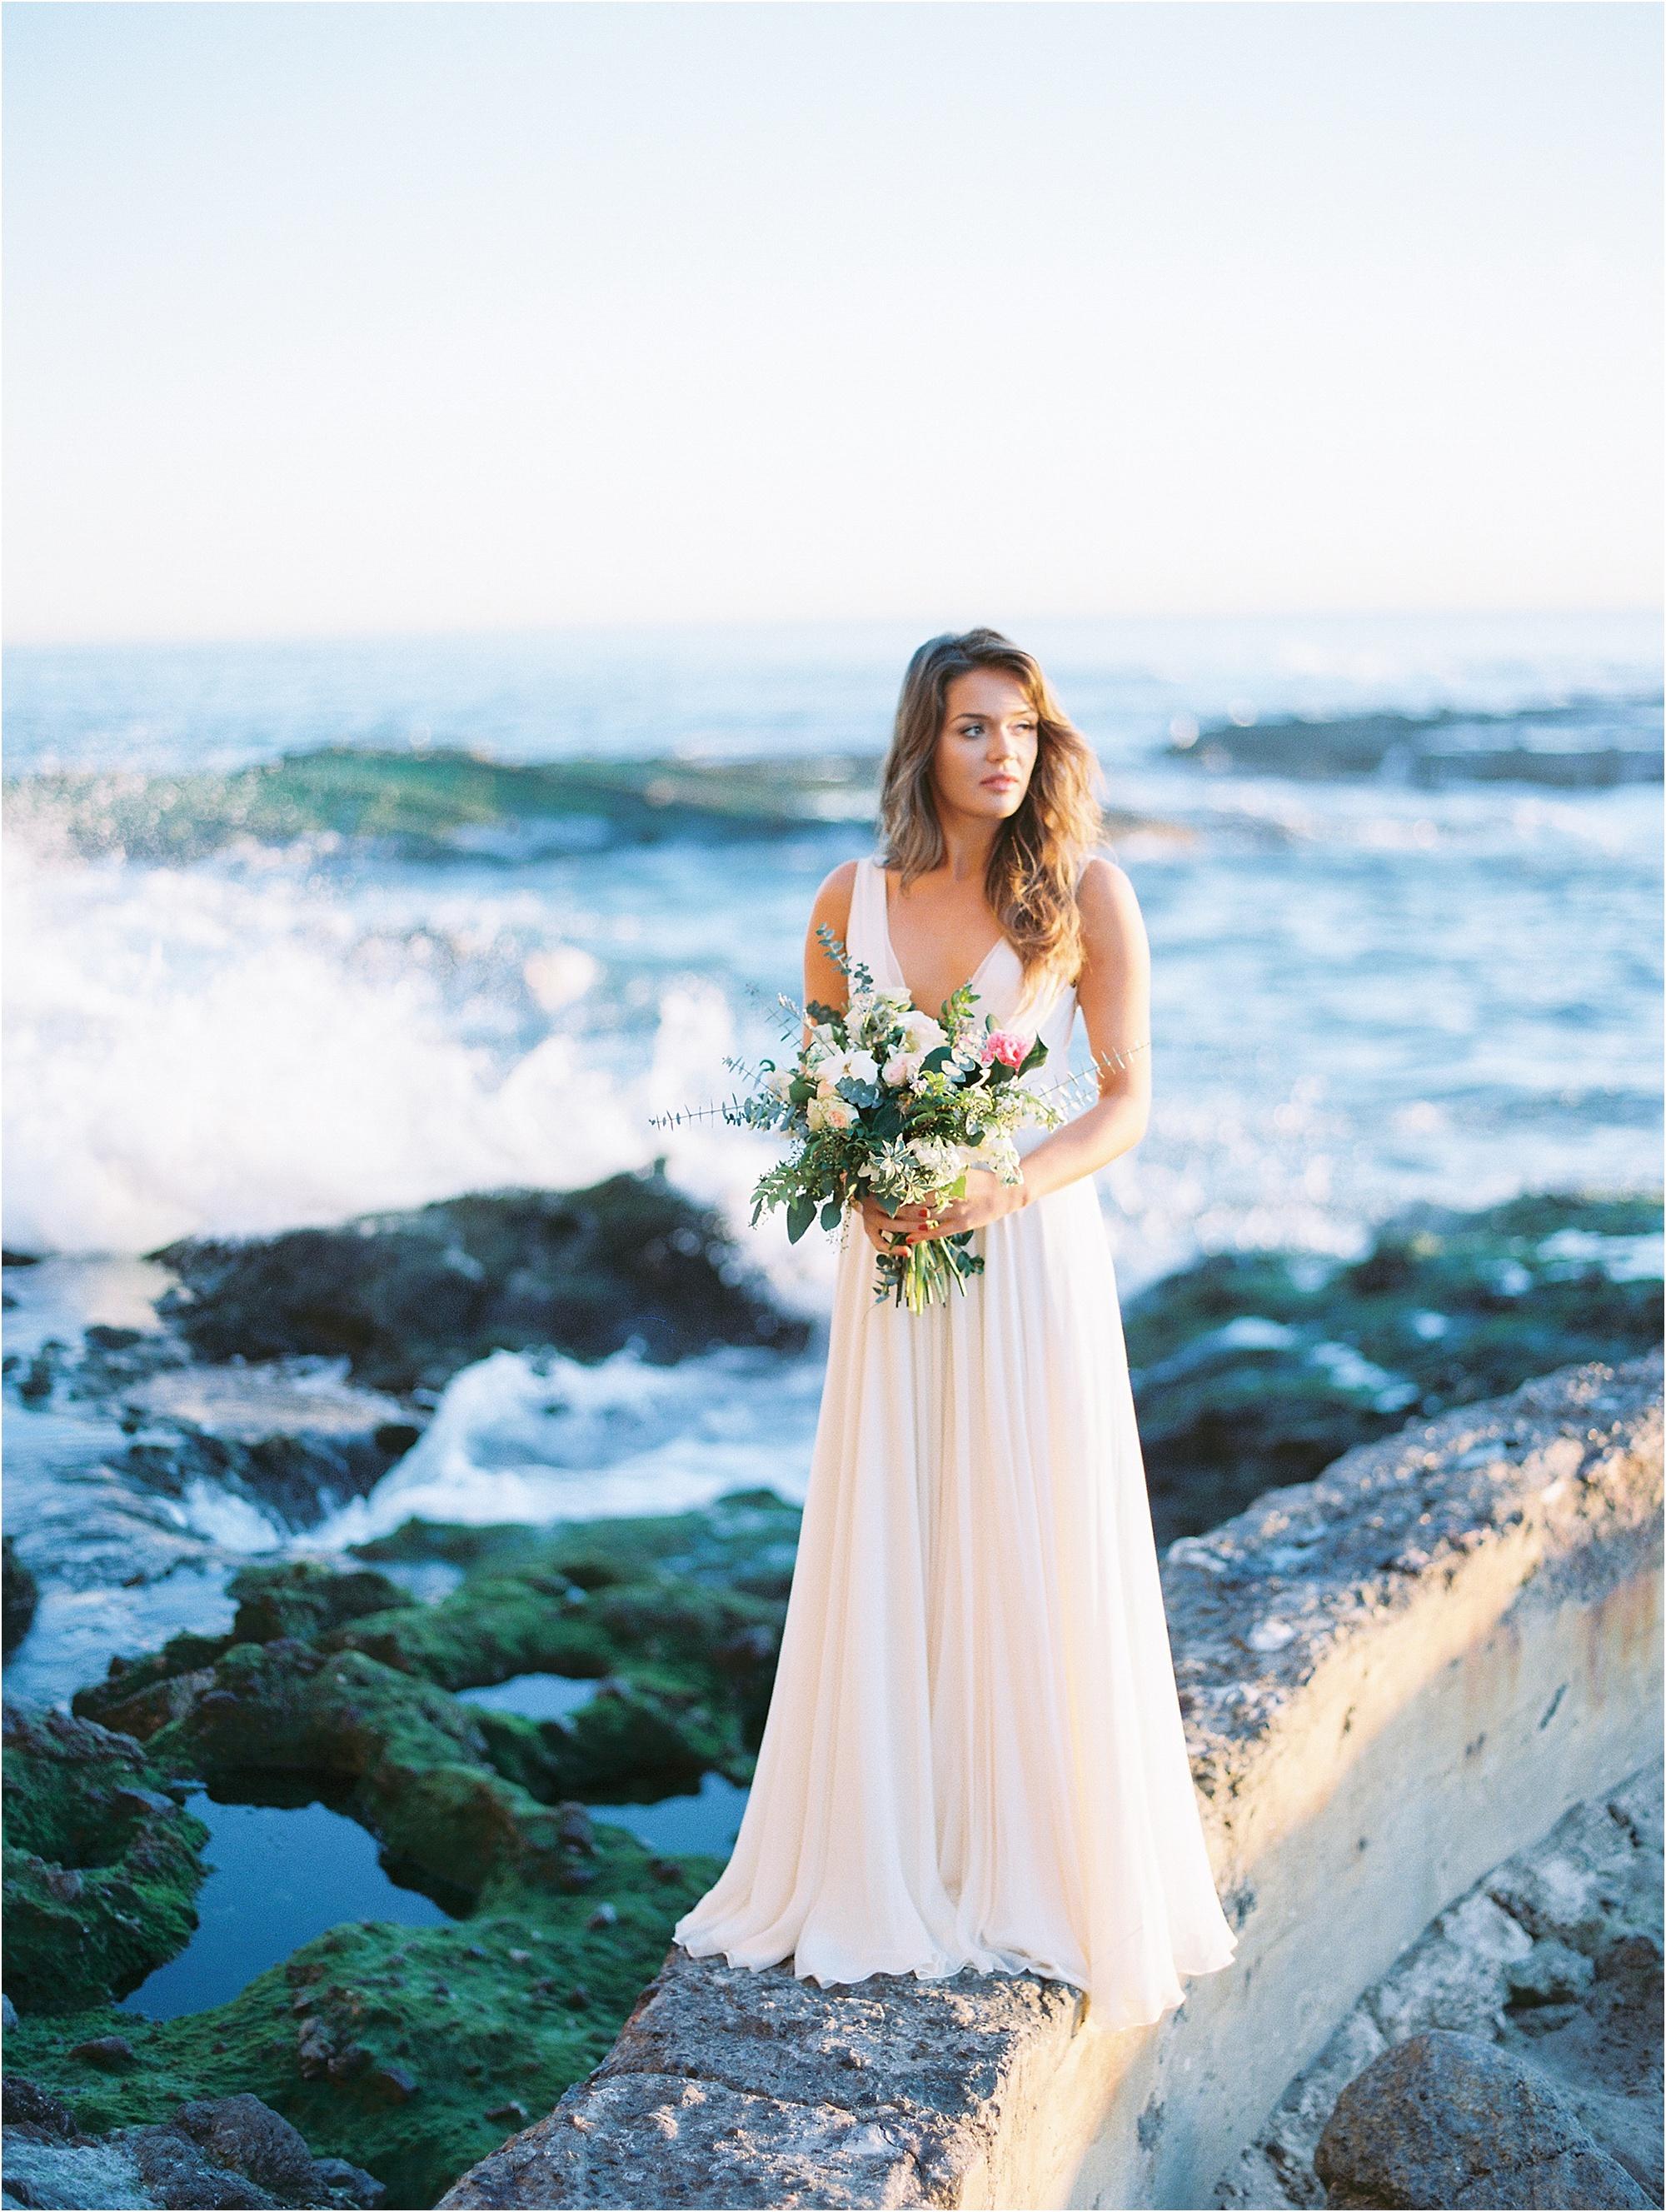 victoria-beach-wedding-inspiration-18.jpg